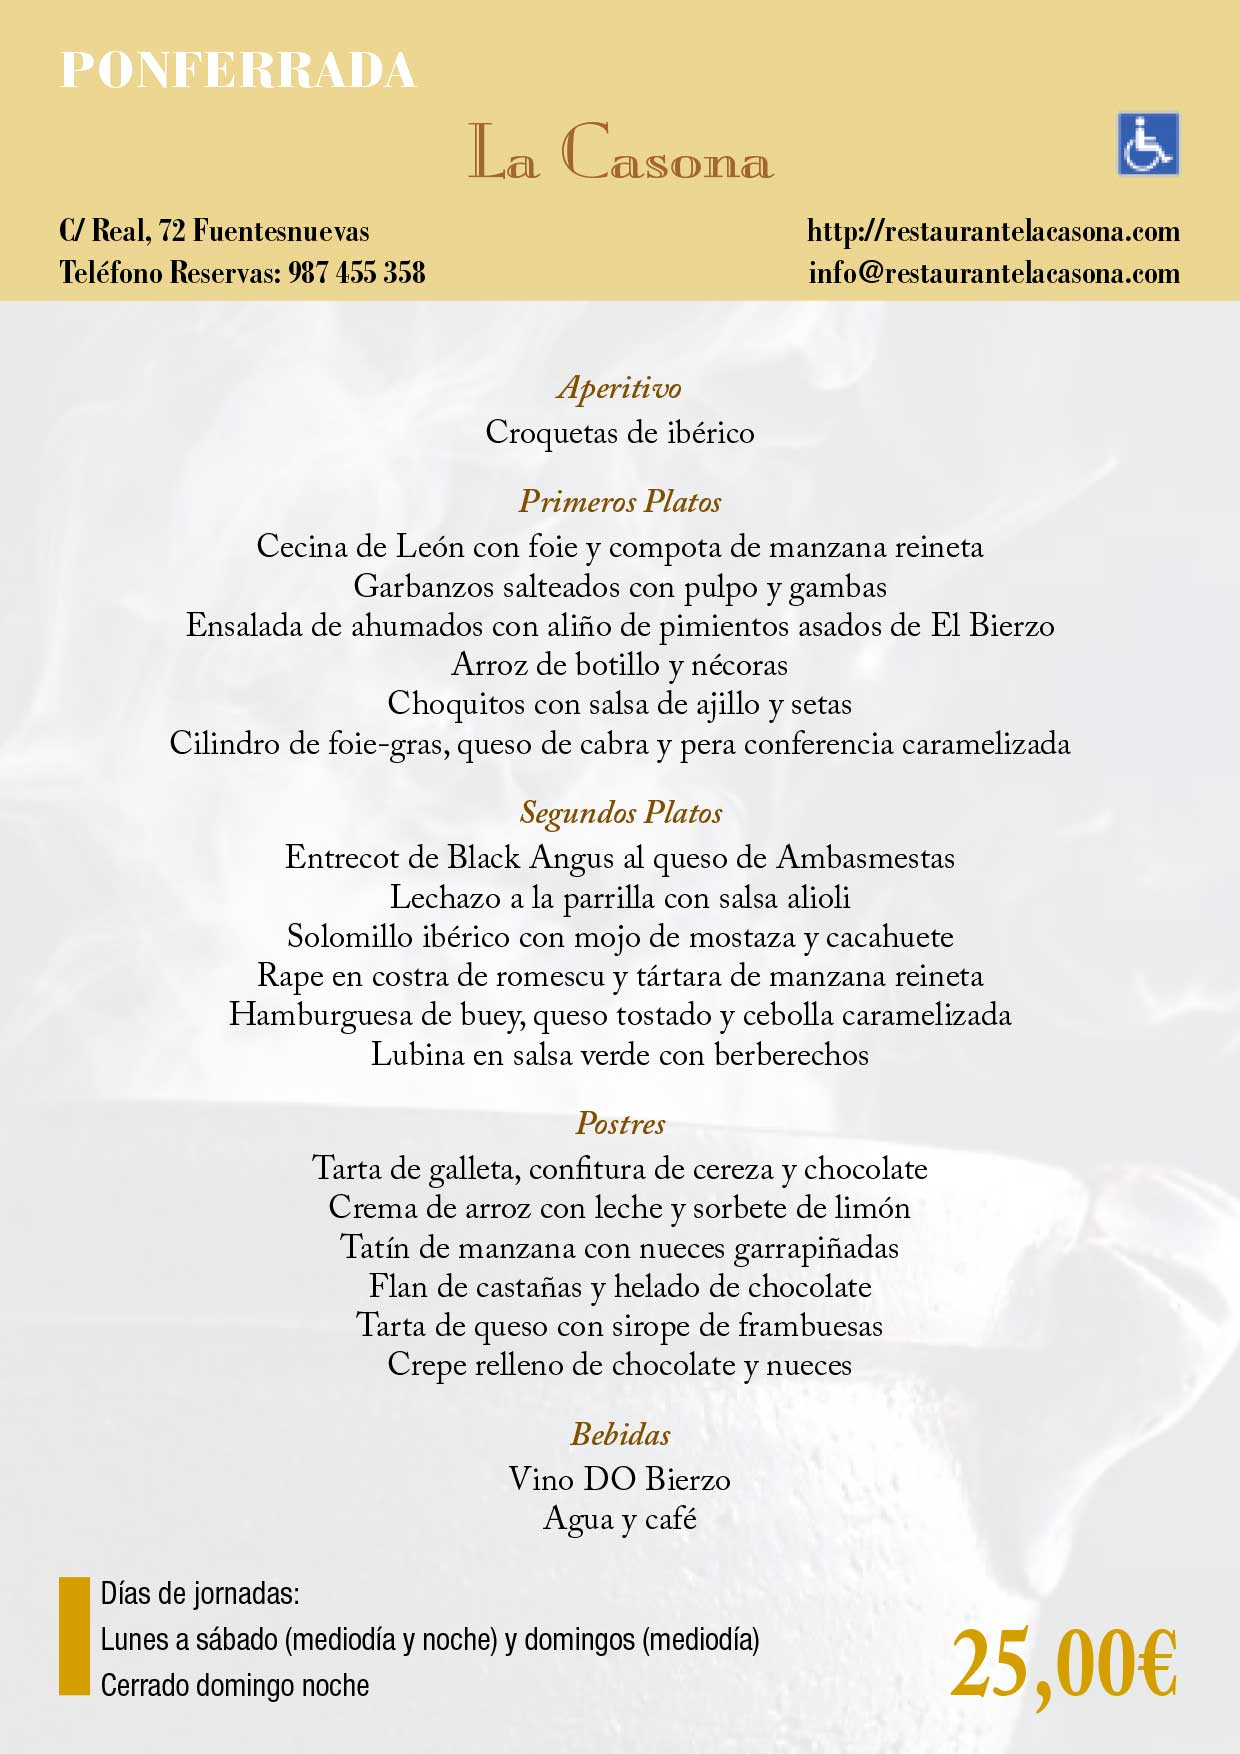 XXXIII Jornadas gastronómicas del Bierzo 2017. Restaurantes participantes 27